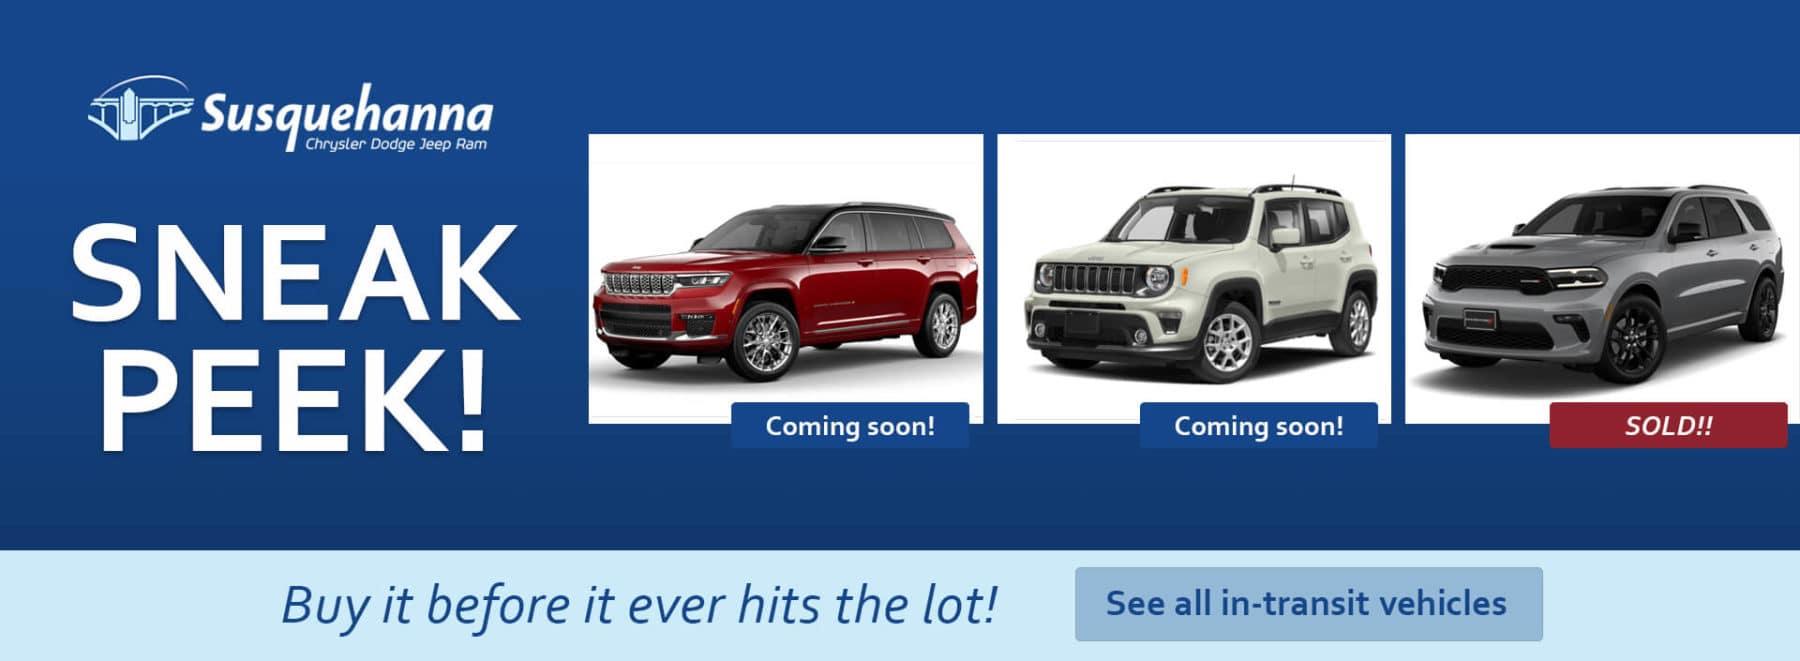 Sneak peek! View all in-transit vehicles!